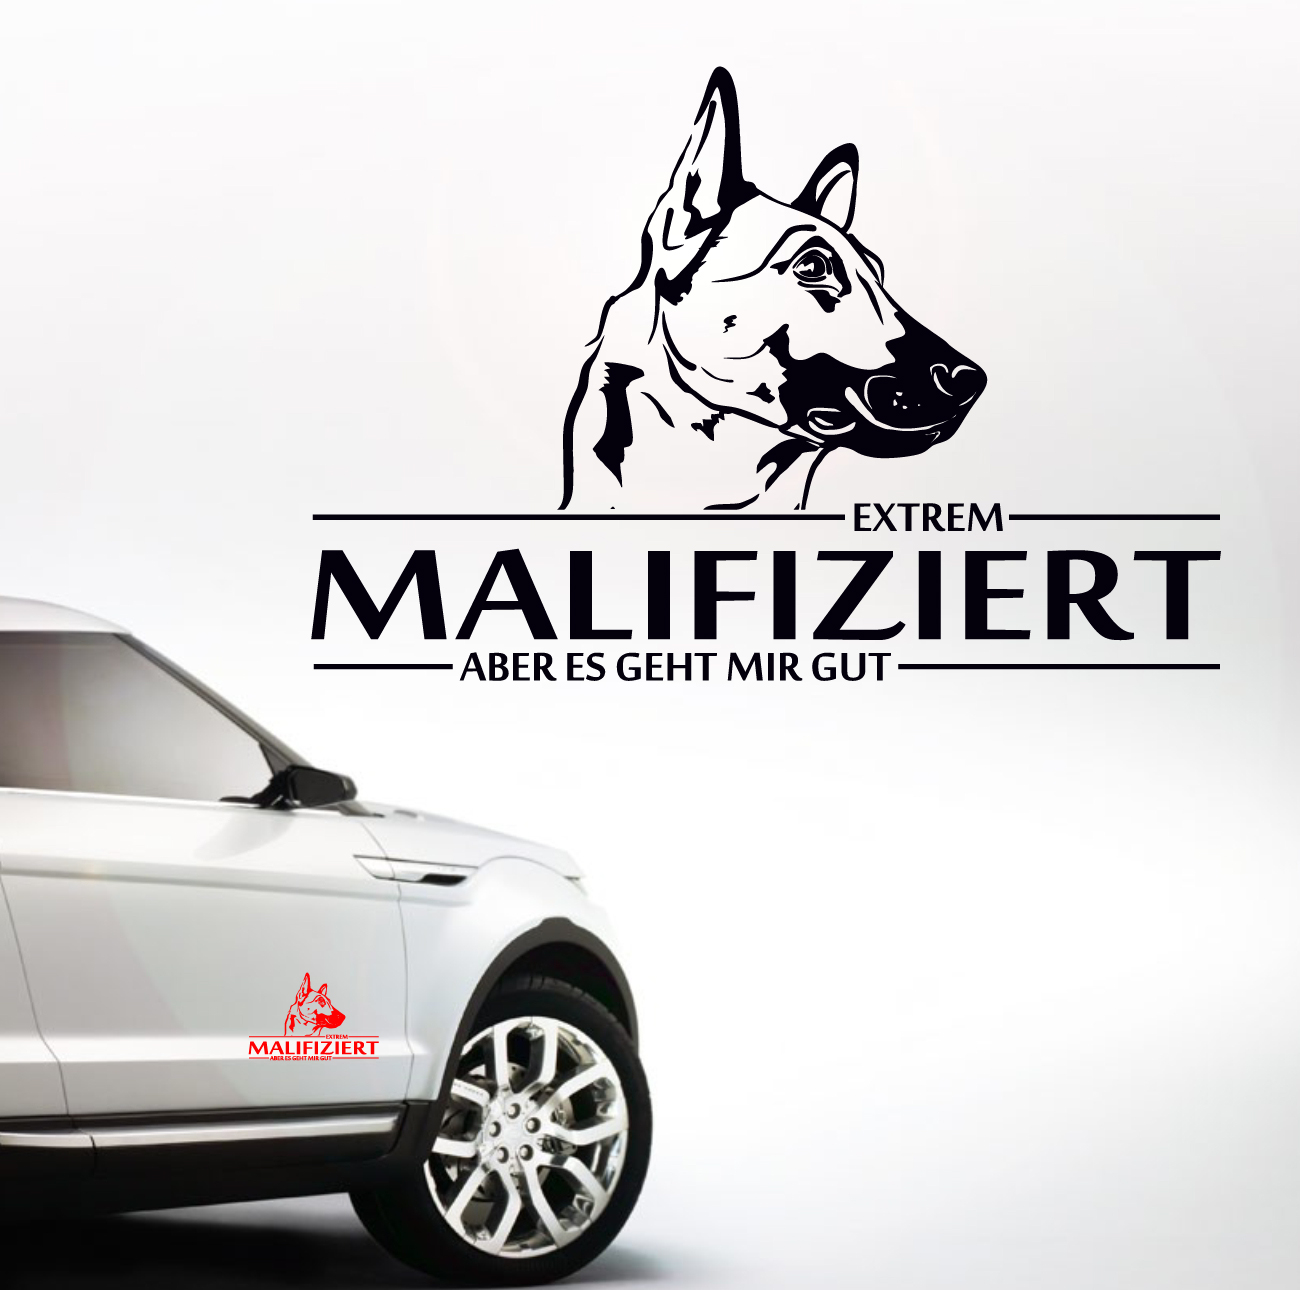 auto aufkleber malifiziert malinois infiziert hund hunde siviwonder ebay. Black Bedroom Furniture Sets. Home Design Ideas